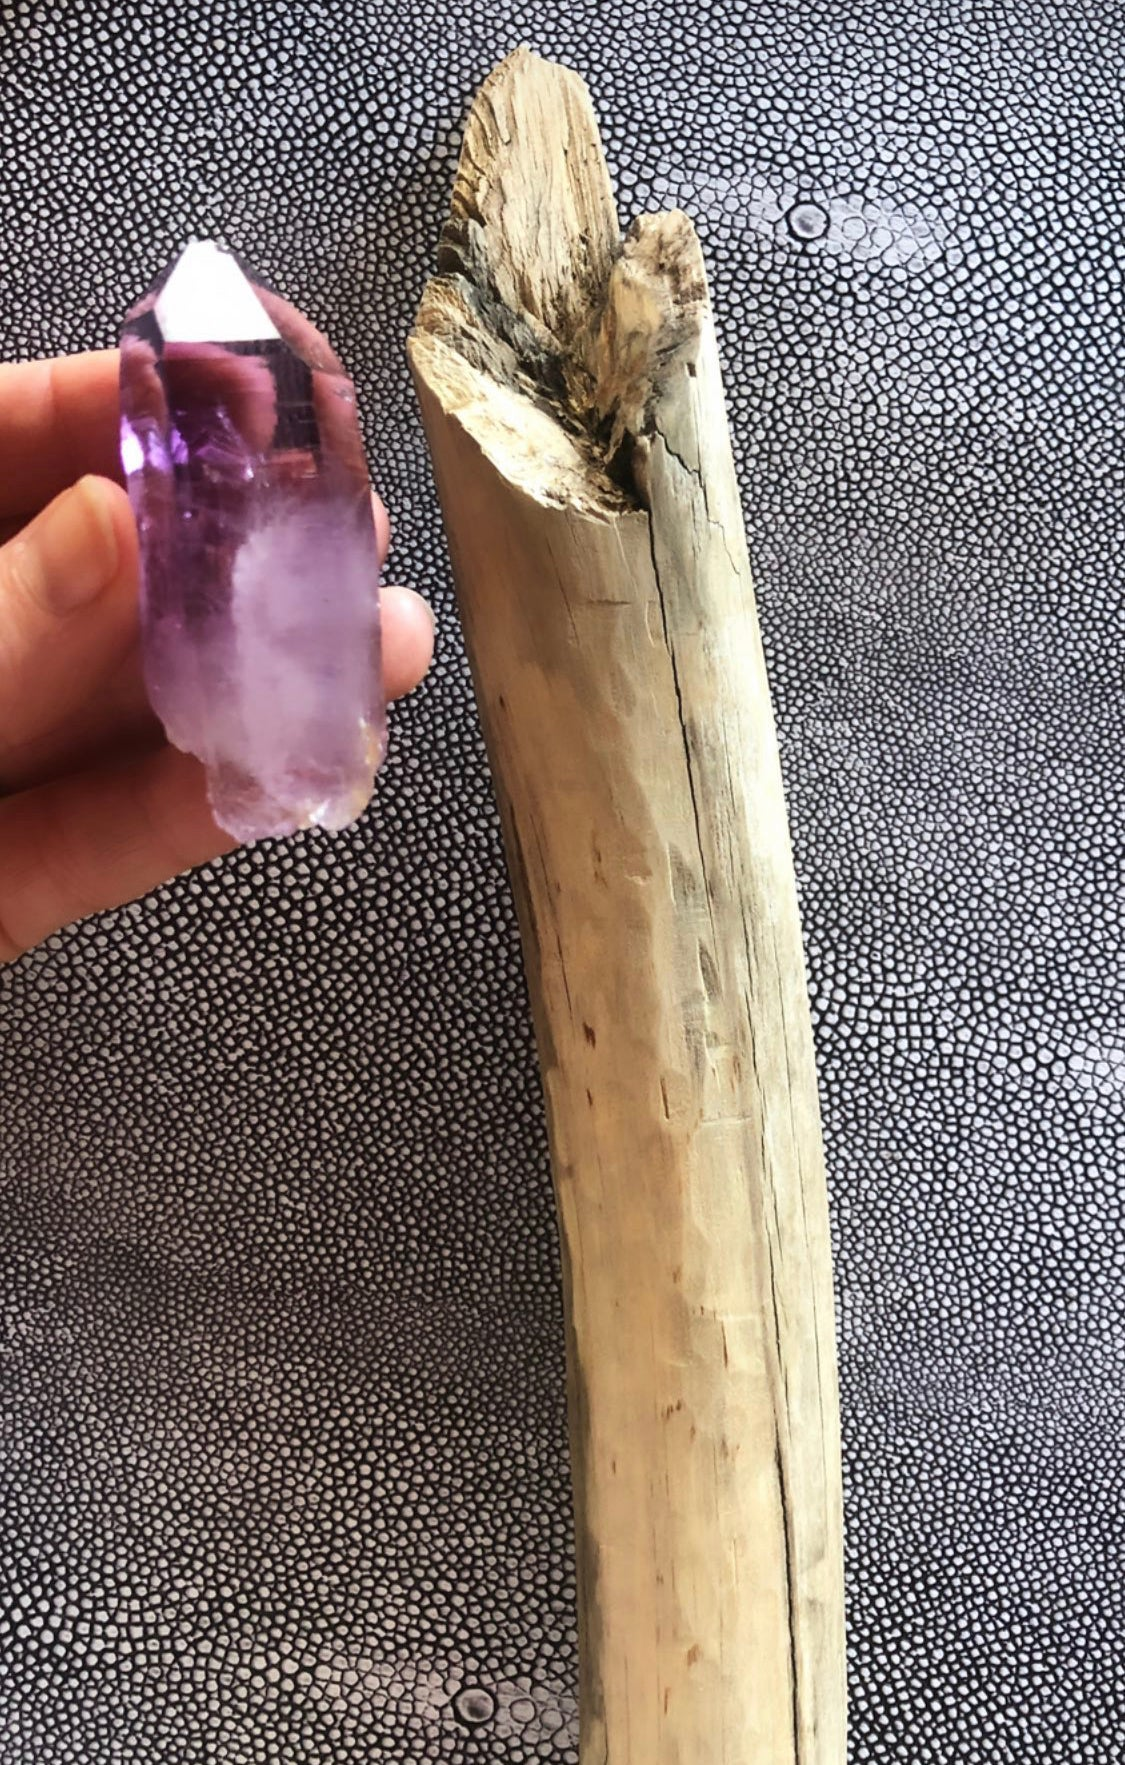 VEGA magic wand #1